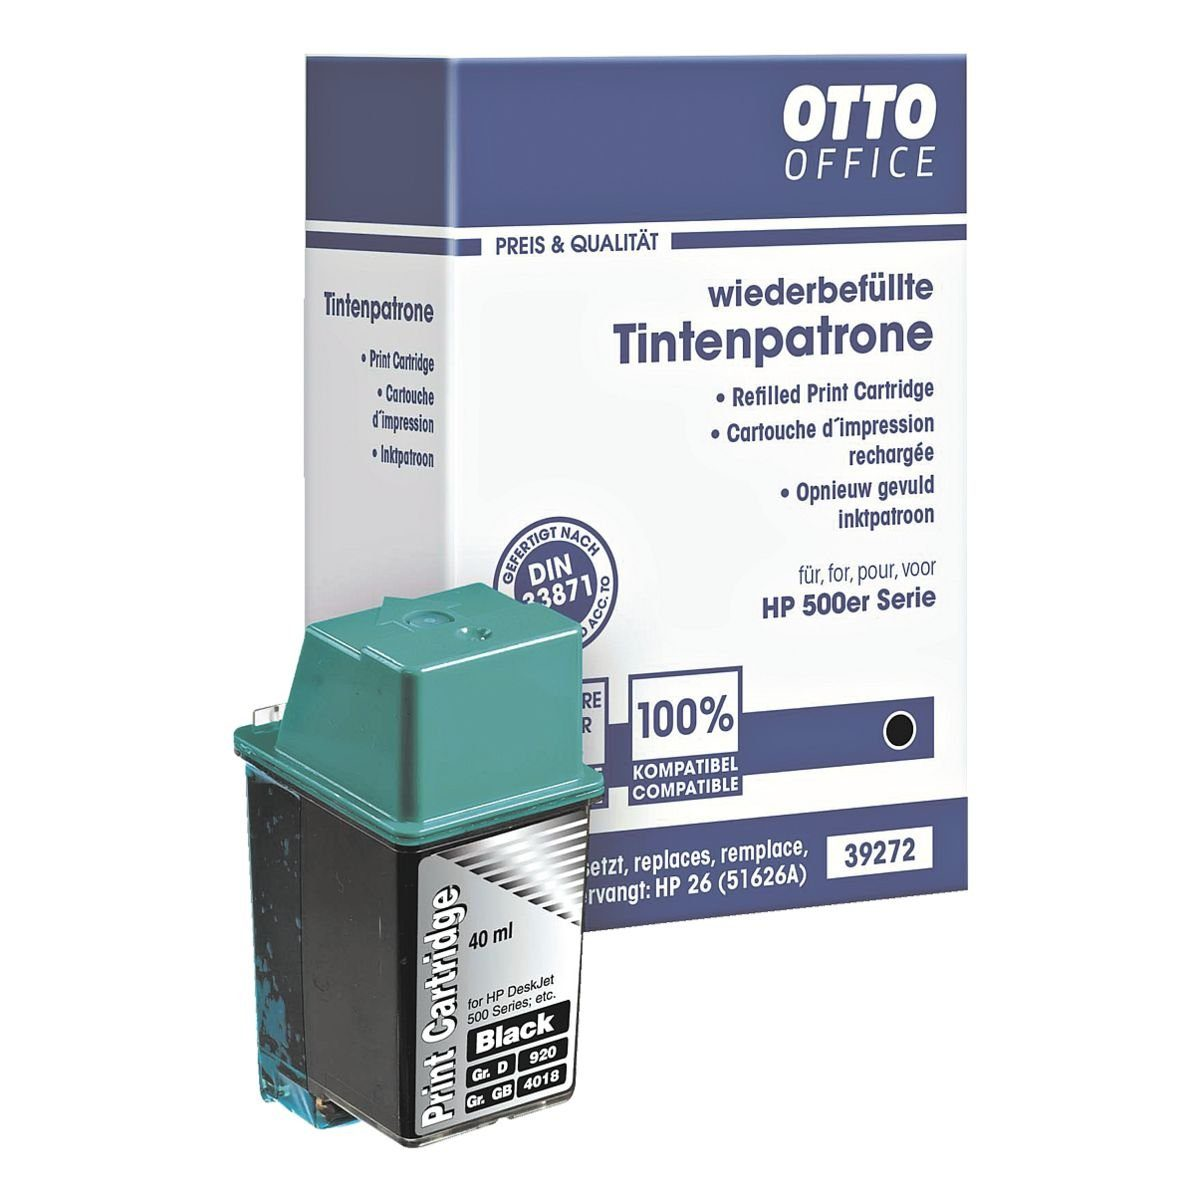 OTTO Office Standard Tintenpatrone ersetzt HP »51626AE« Nr. 26